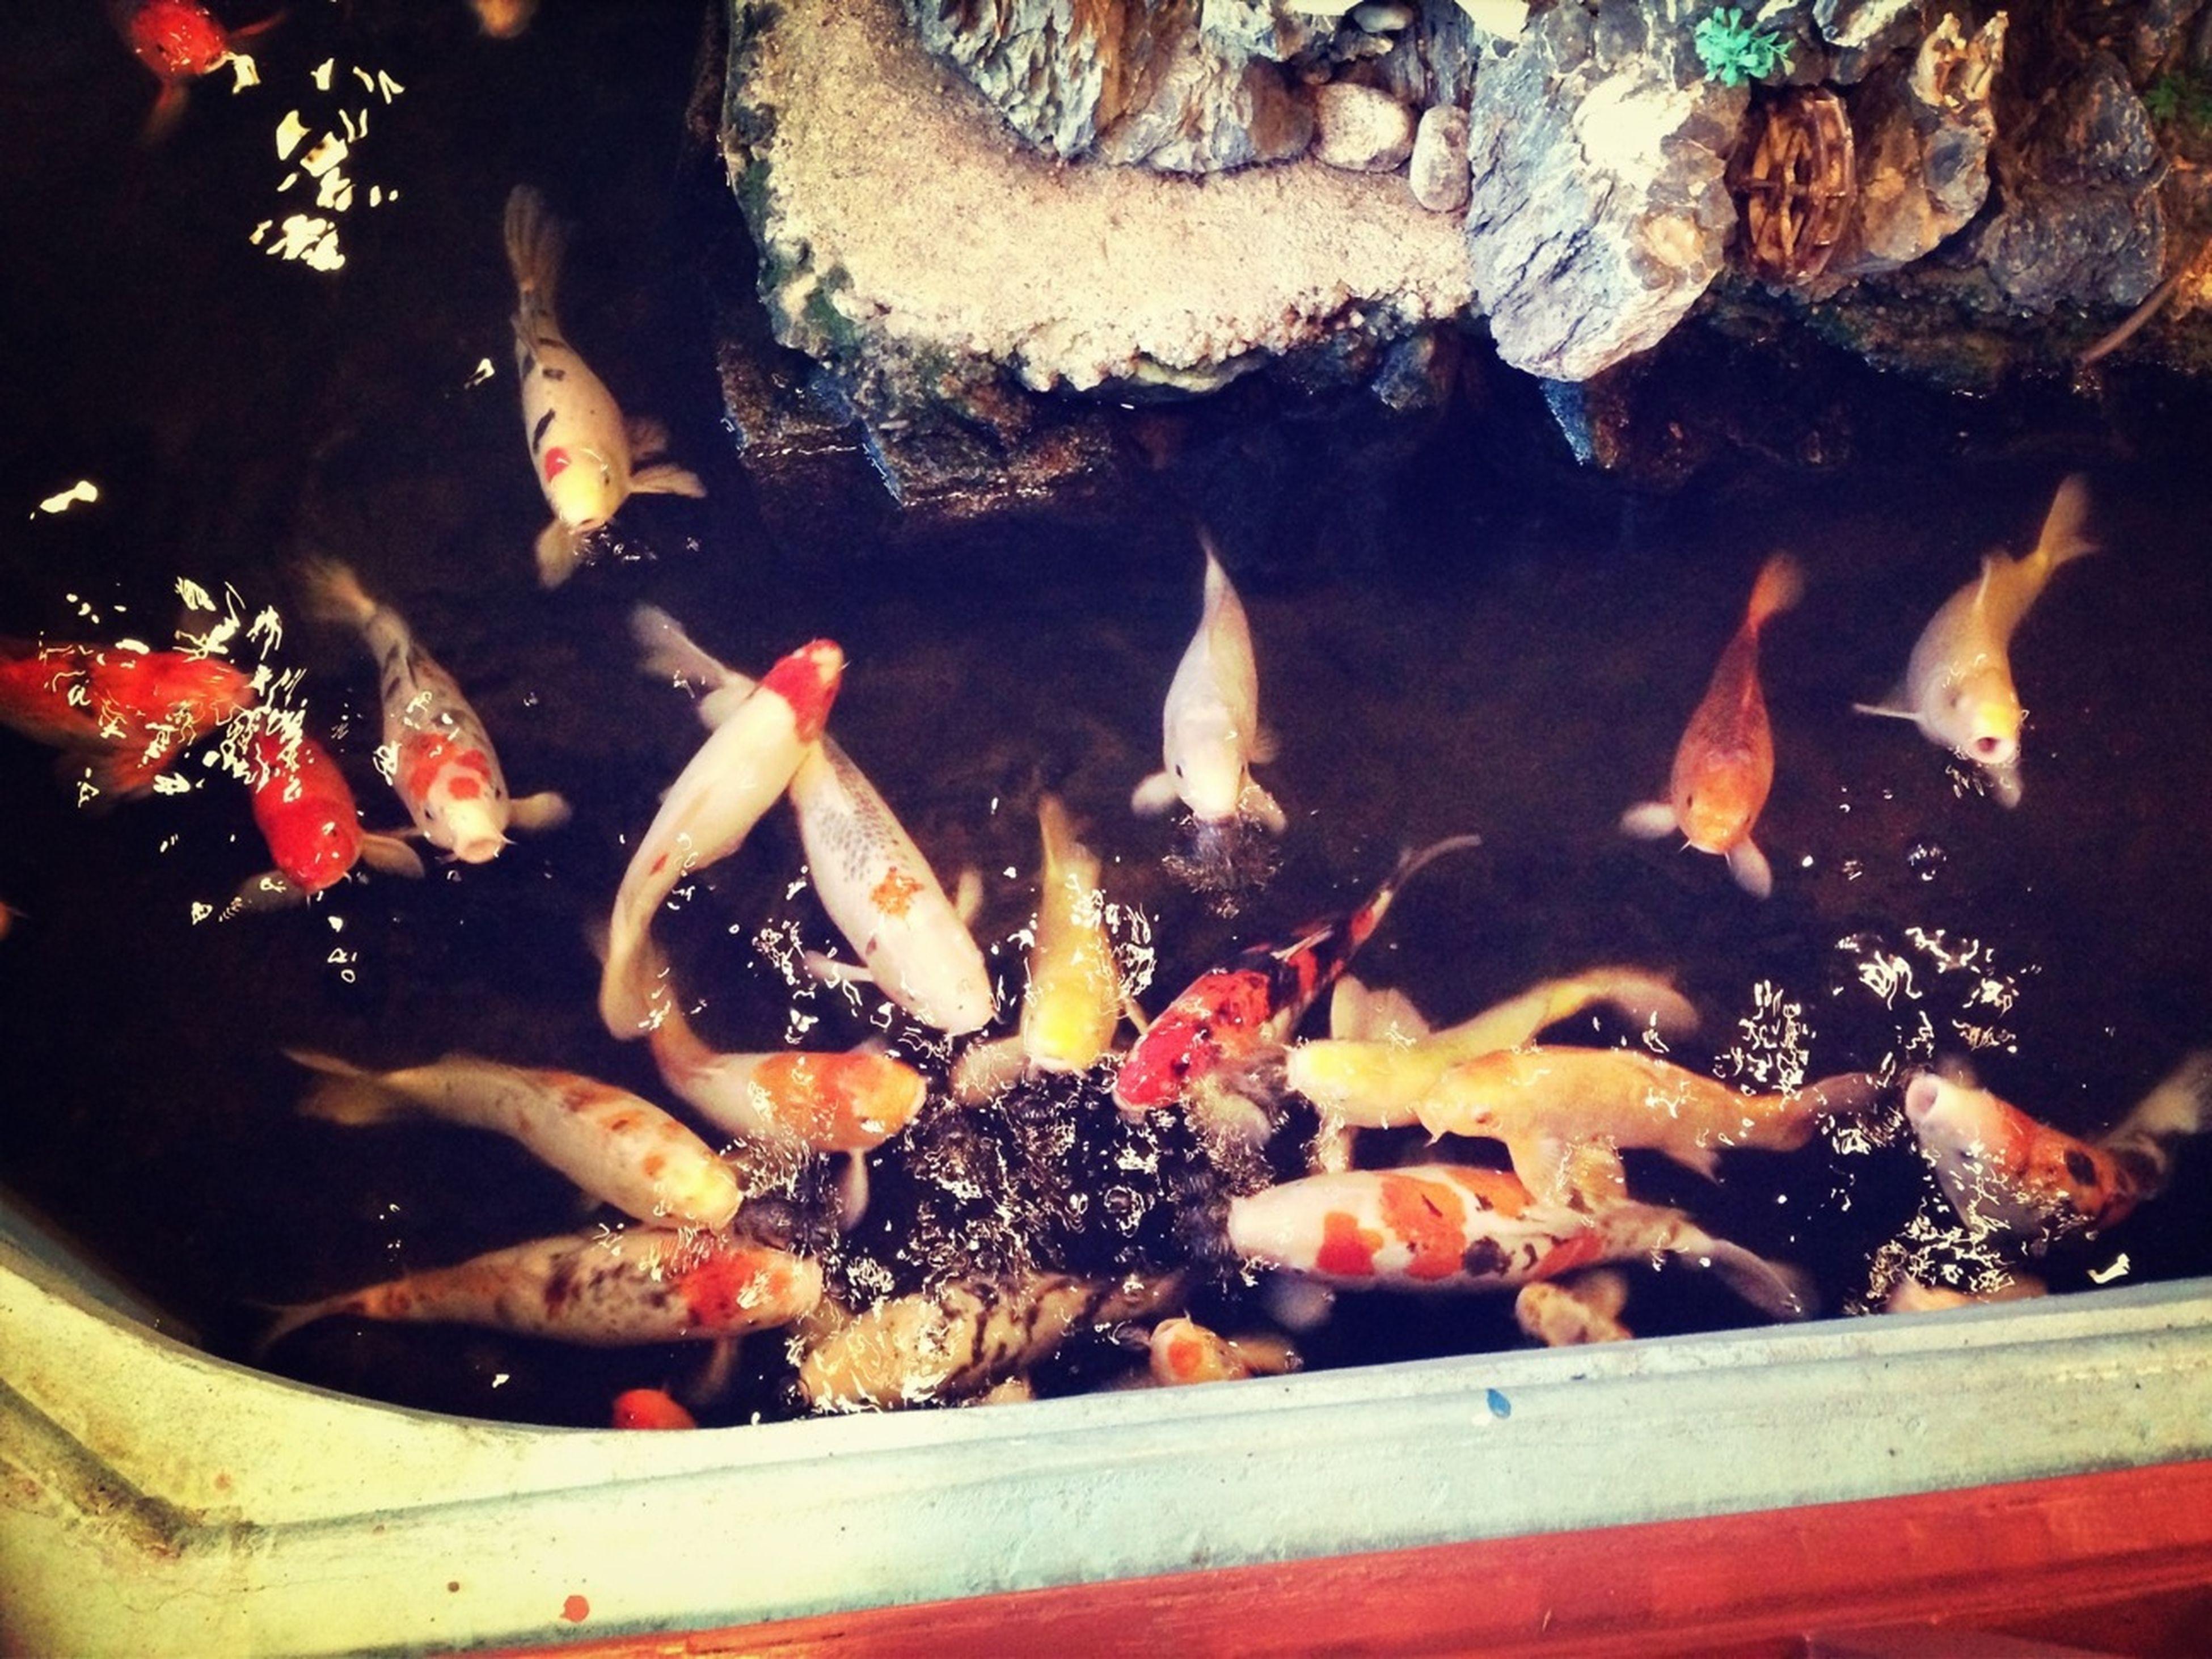 animal themes, fish, animals in the wild, wildlife, water, high angle view, sea life, swimming, medium group of animals, indoors, underwater, seafood, koi carp, animals in captivity, pond, nature, four animals, bird